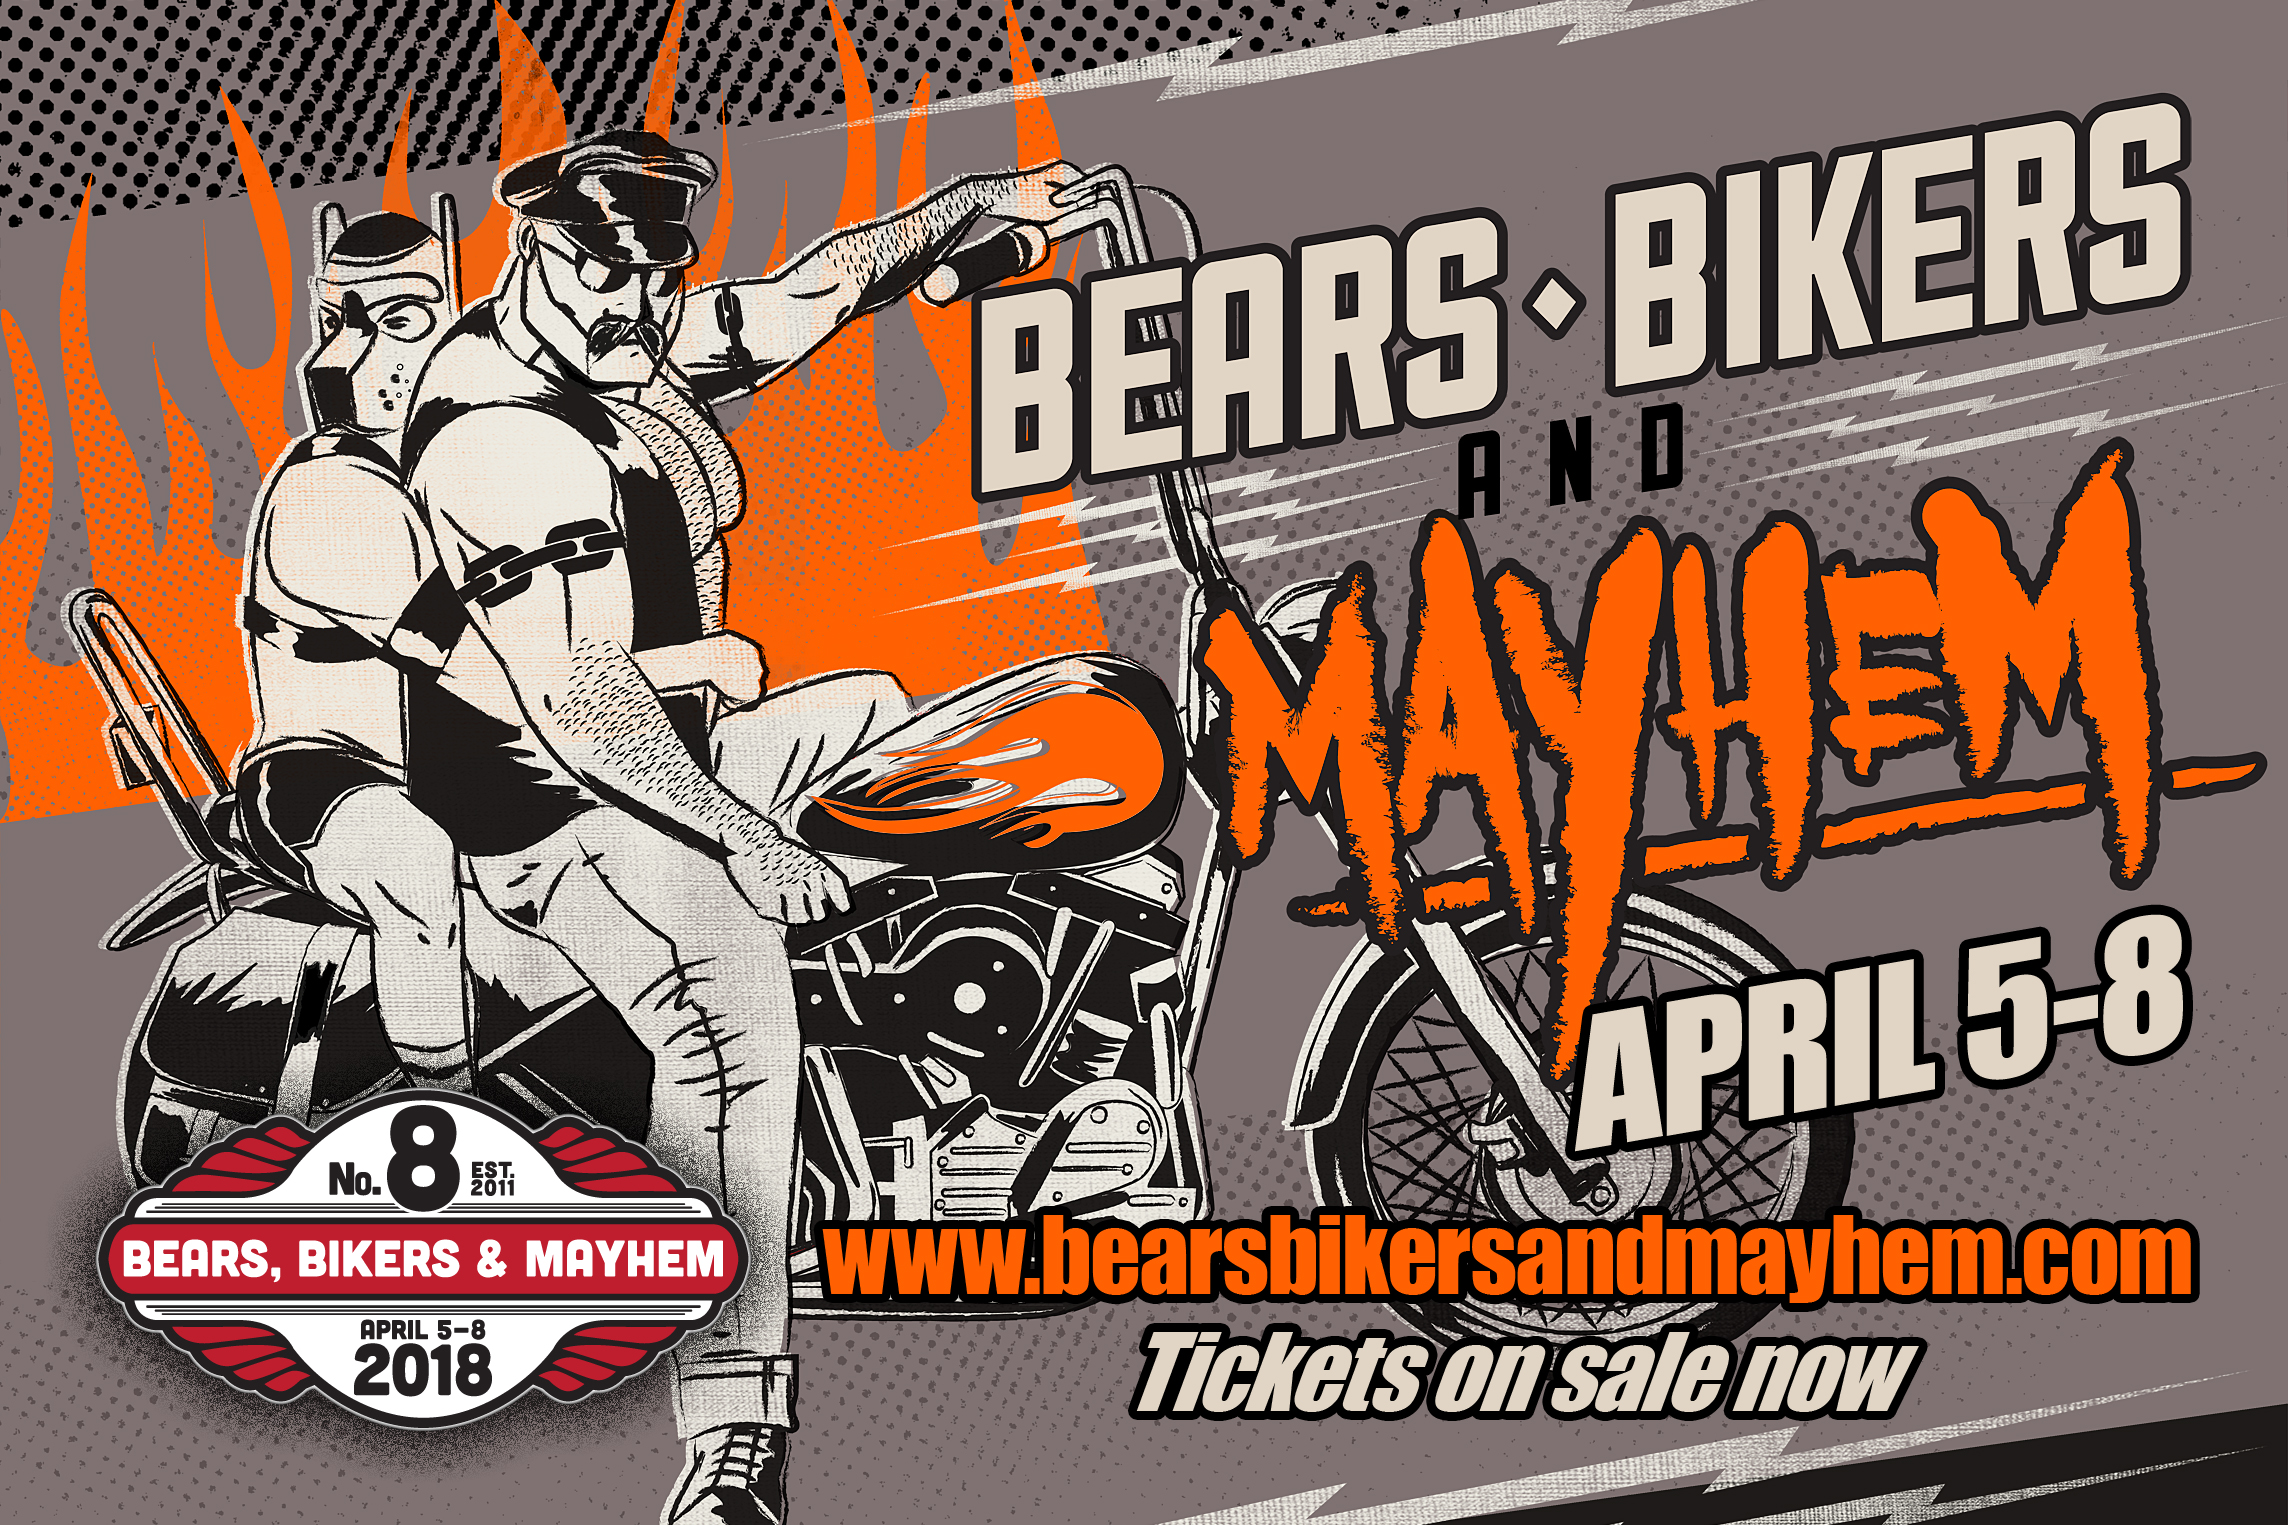 Bears, Bikers & Mayhem